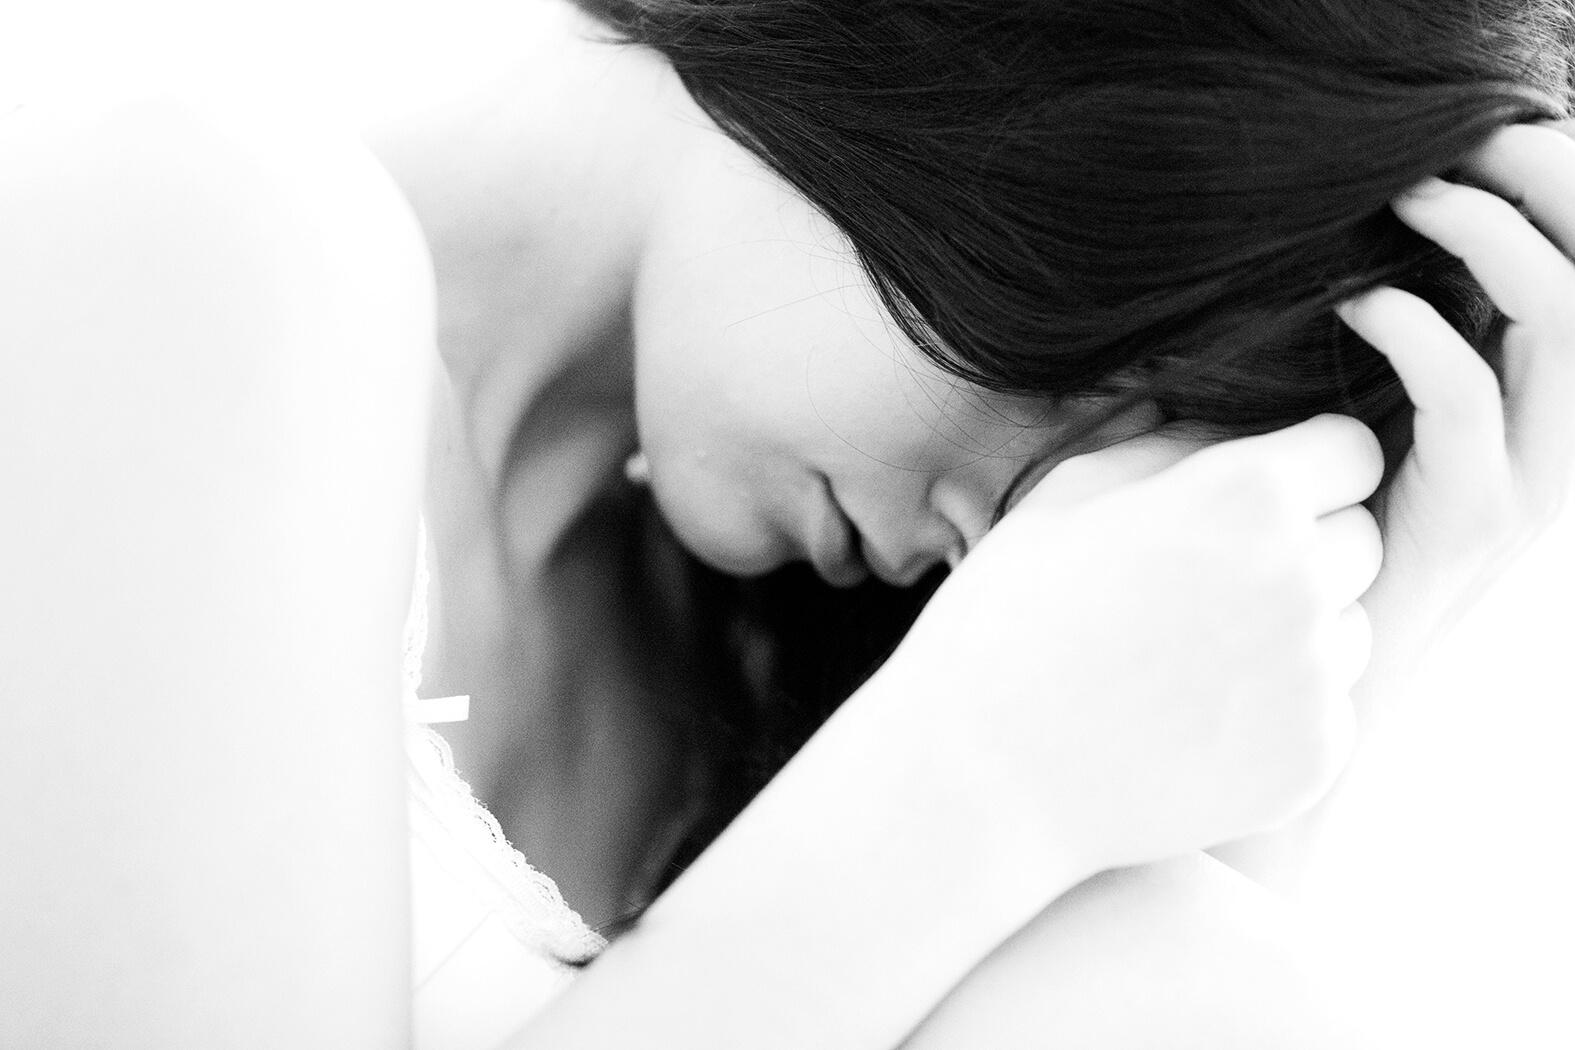 Teilakt, Rahn Photography, Desty, Model, schwarz weiß, sw, sinnlich, Sinnlichkeit, Rahn Photography, Teilakt,